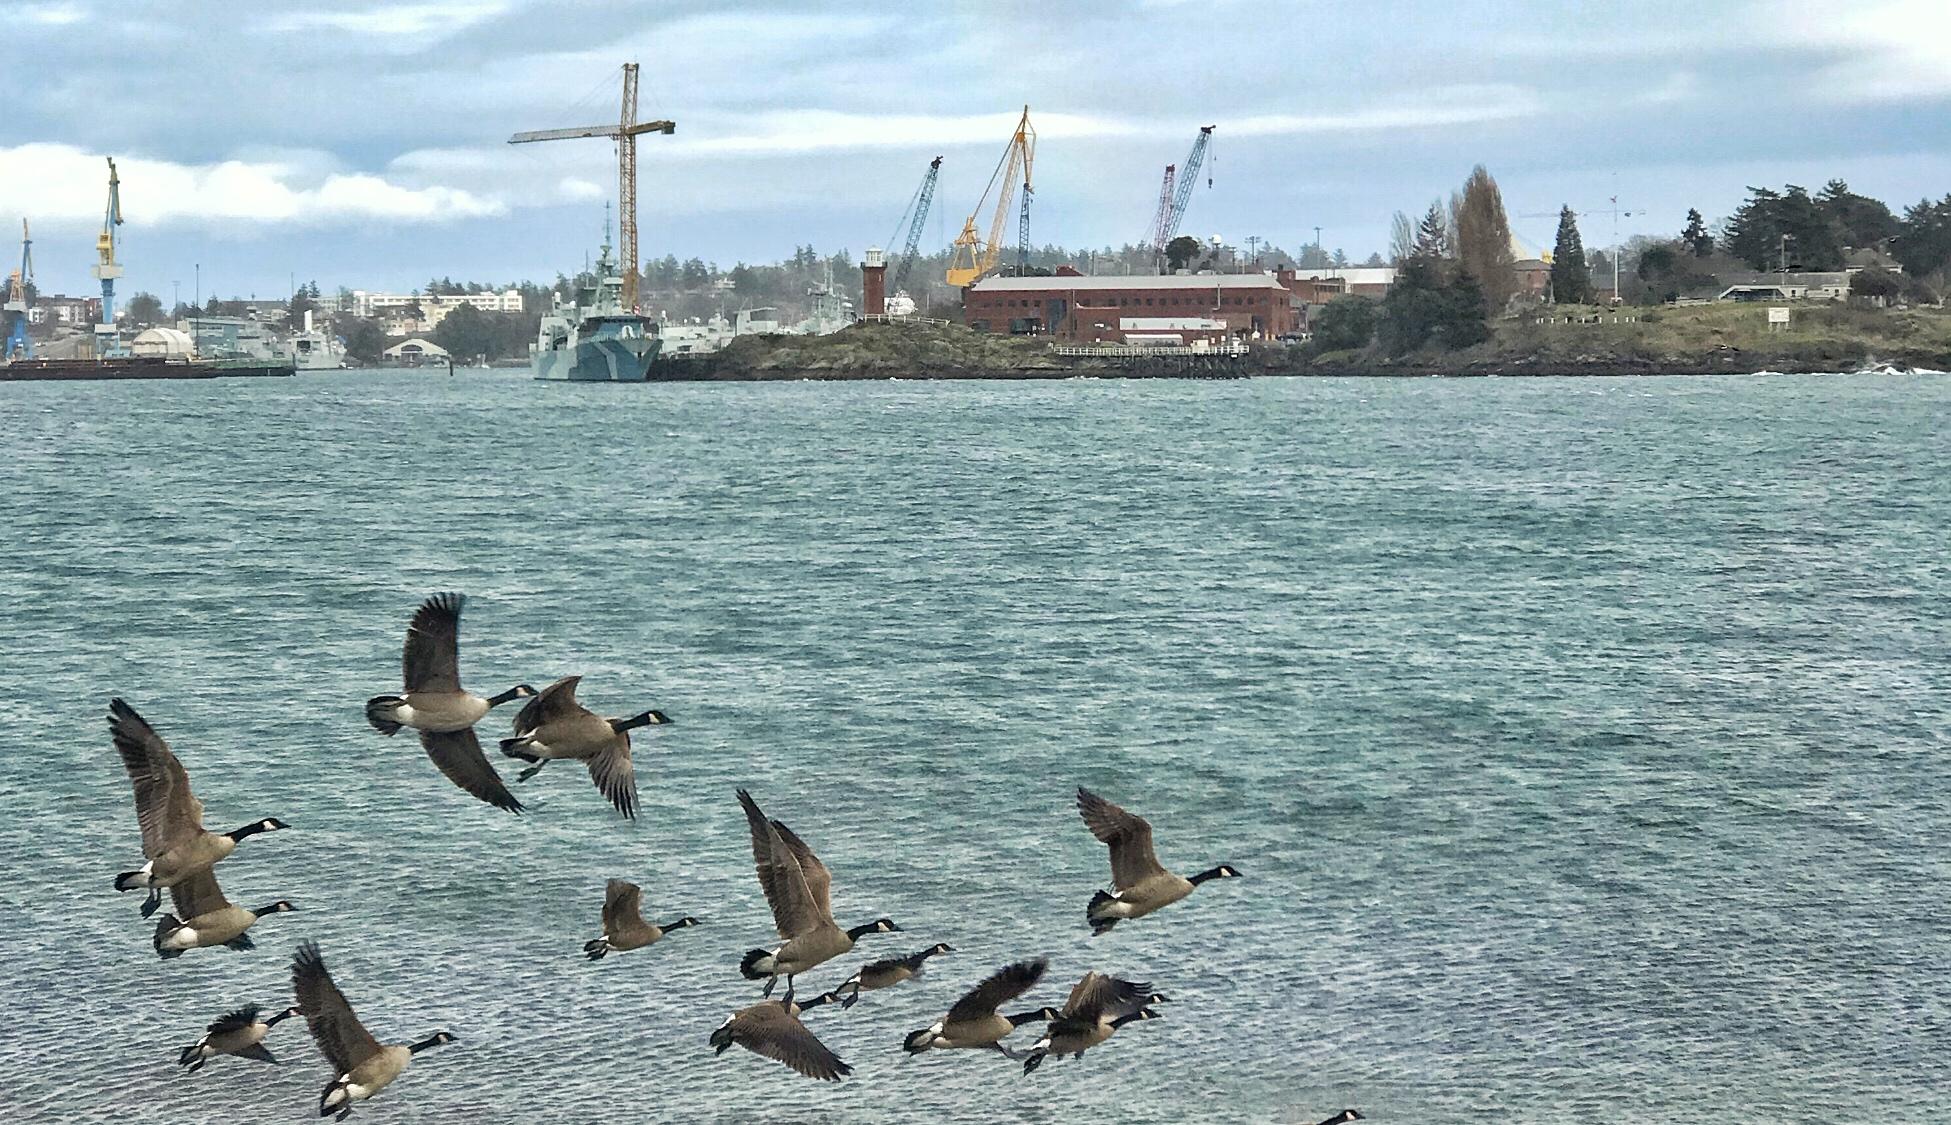 The local economic impact of Canada's Pacific Fleet